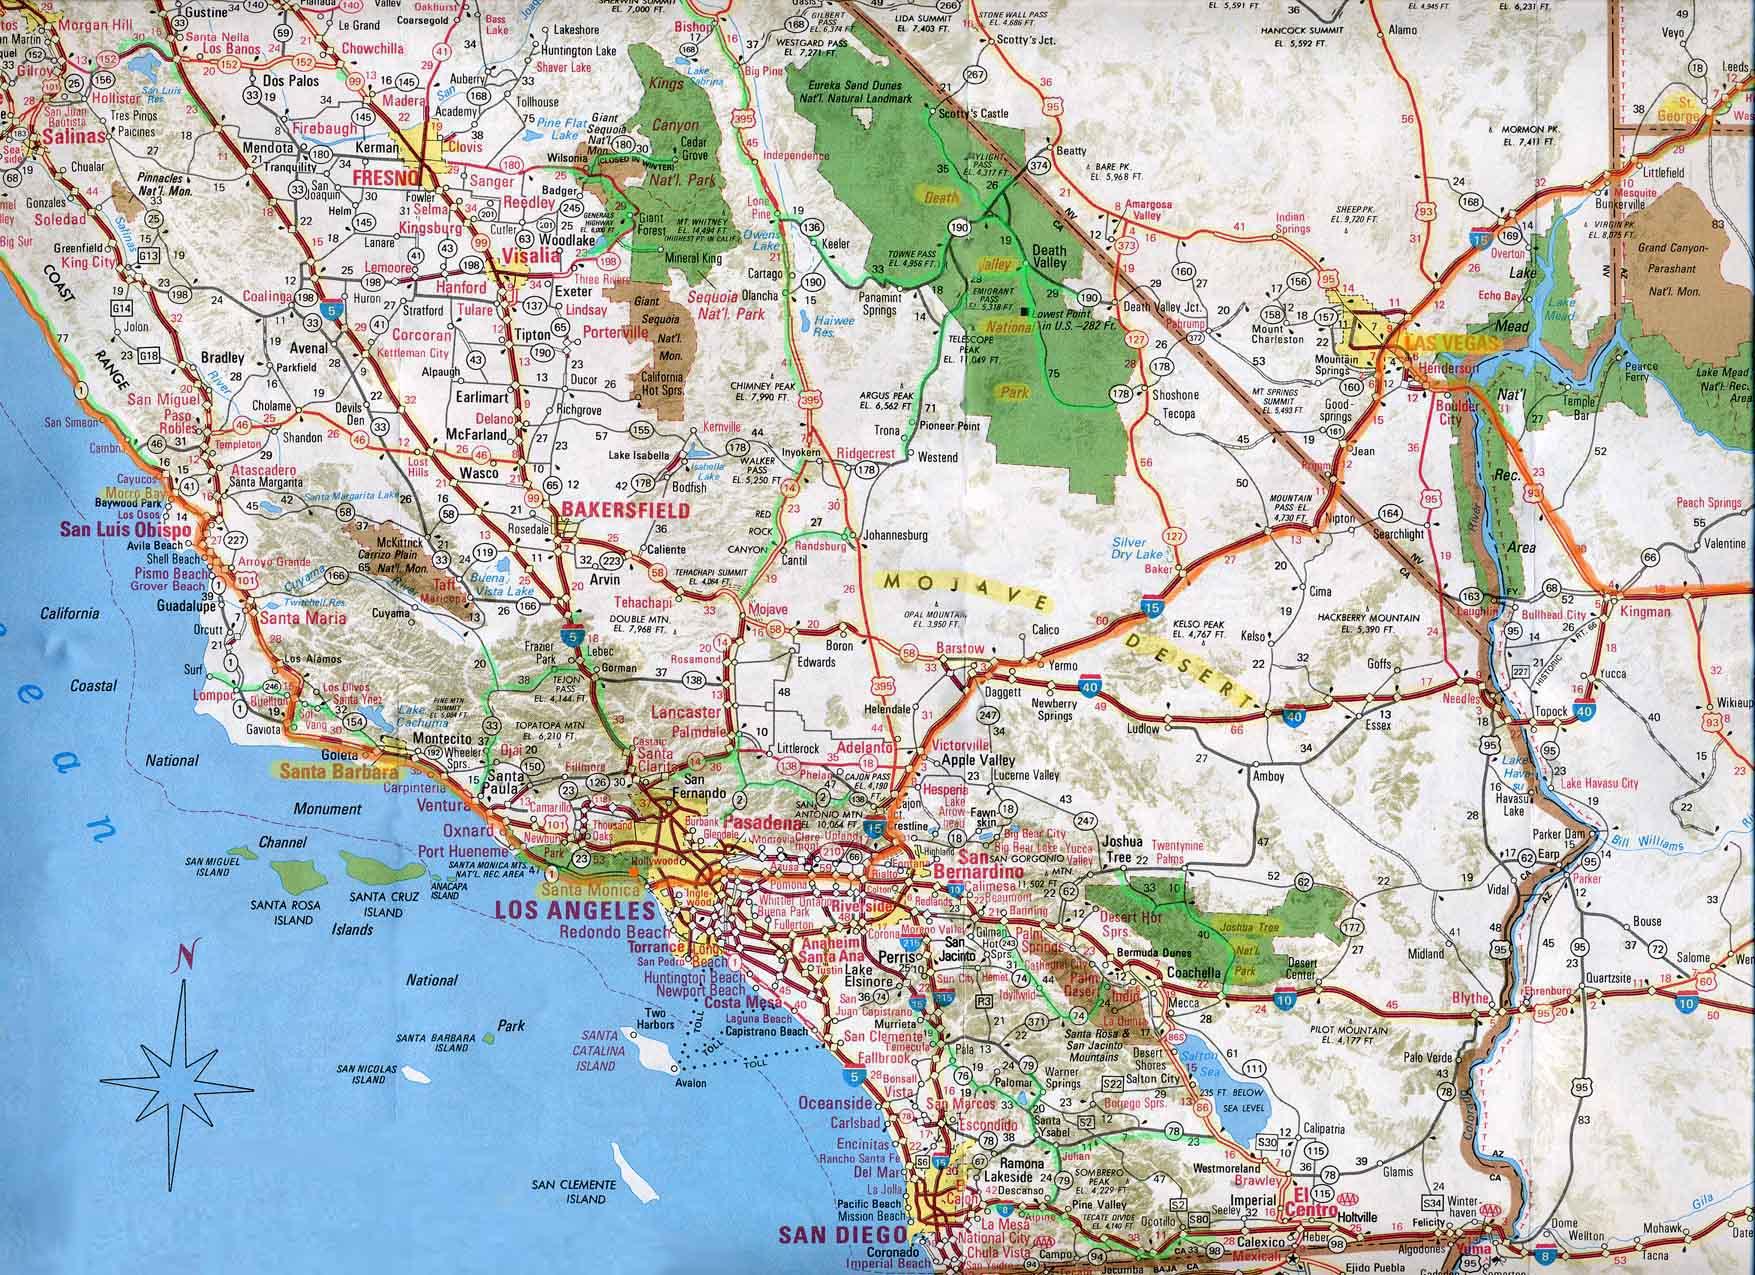 Southern California Map From Kolovrat 5 - Ameliabd - Map Of Southeastern California